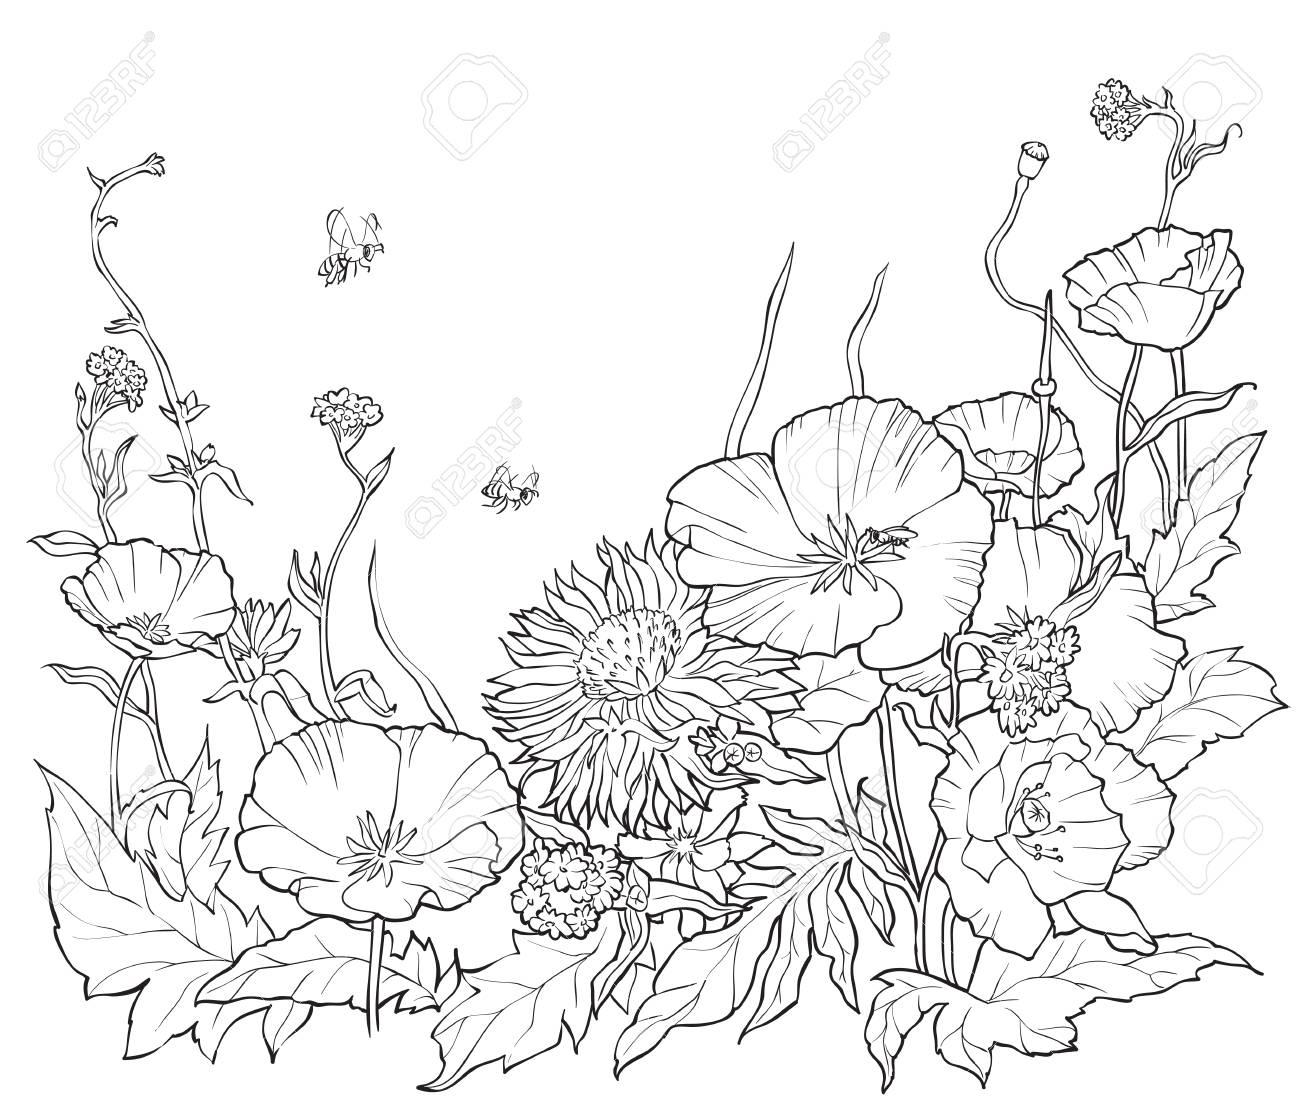 Libro Para Colorear Con Flores Dibujadas A Mano. Ilustración De ...